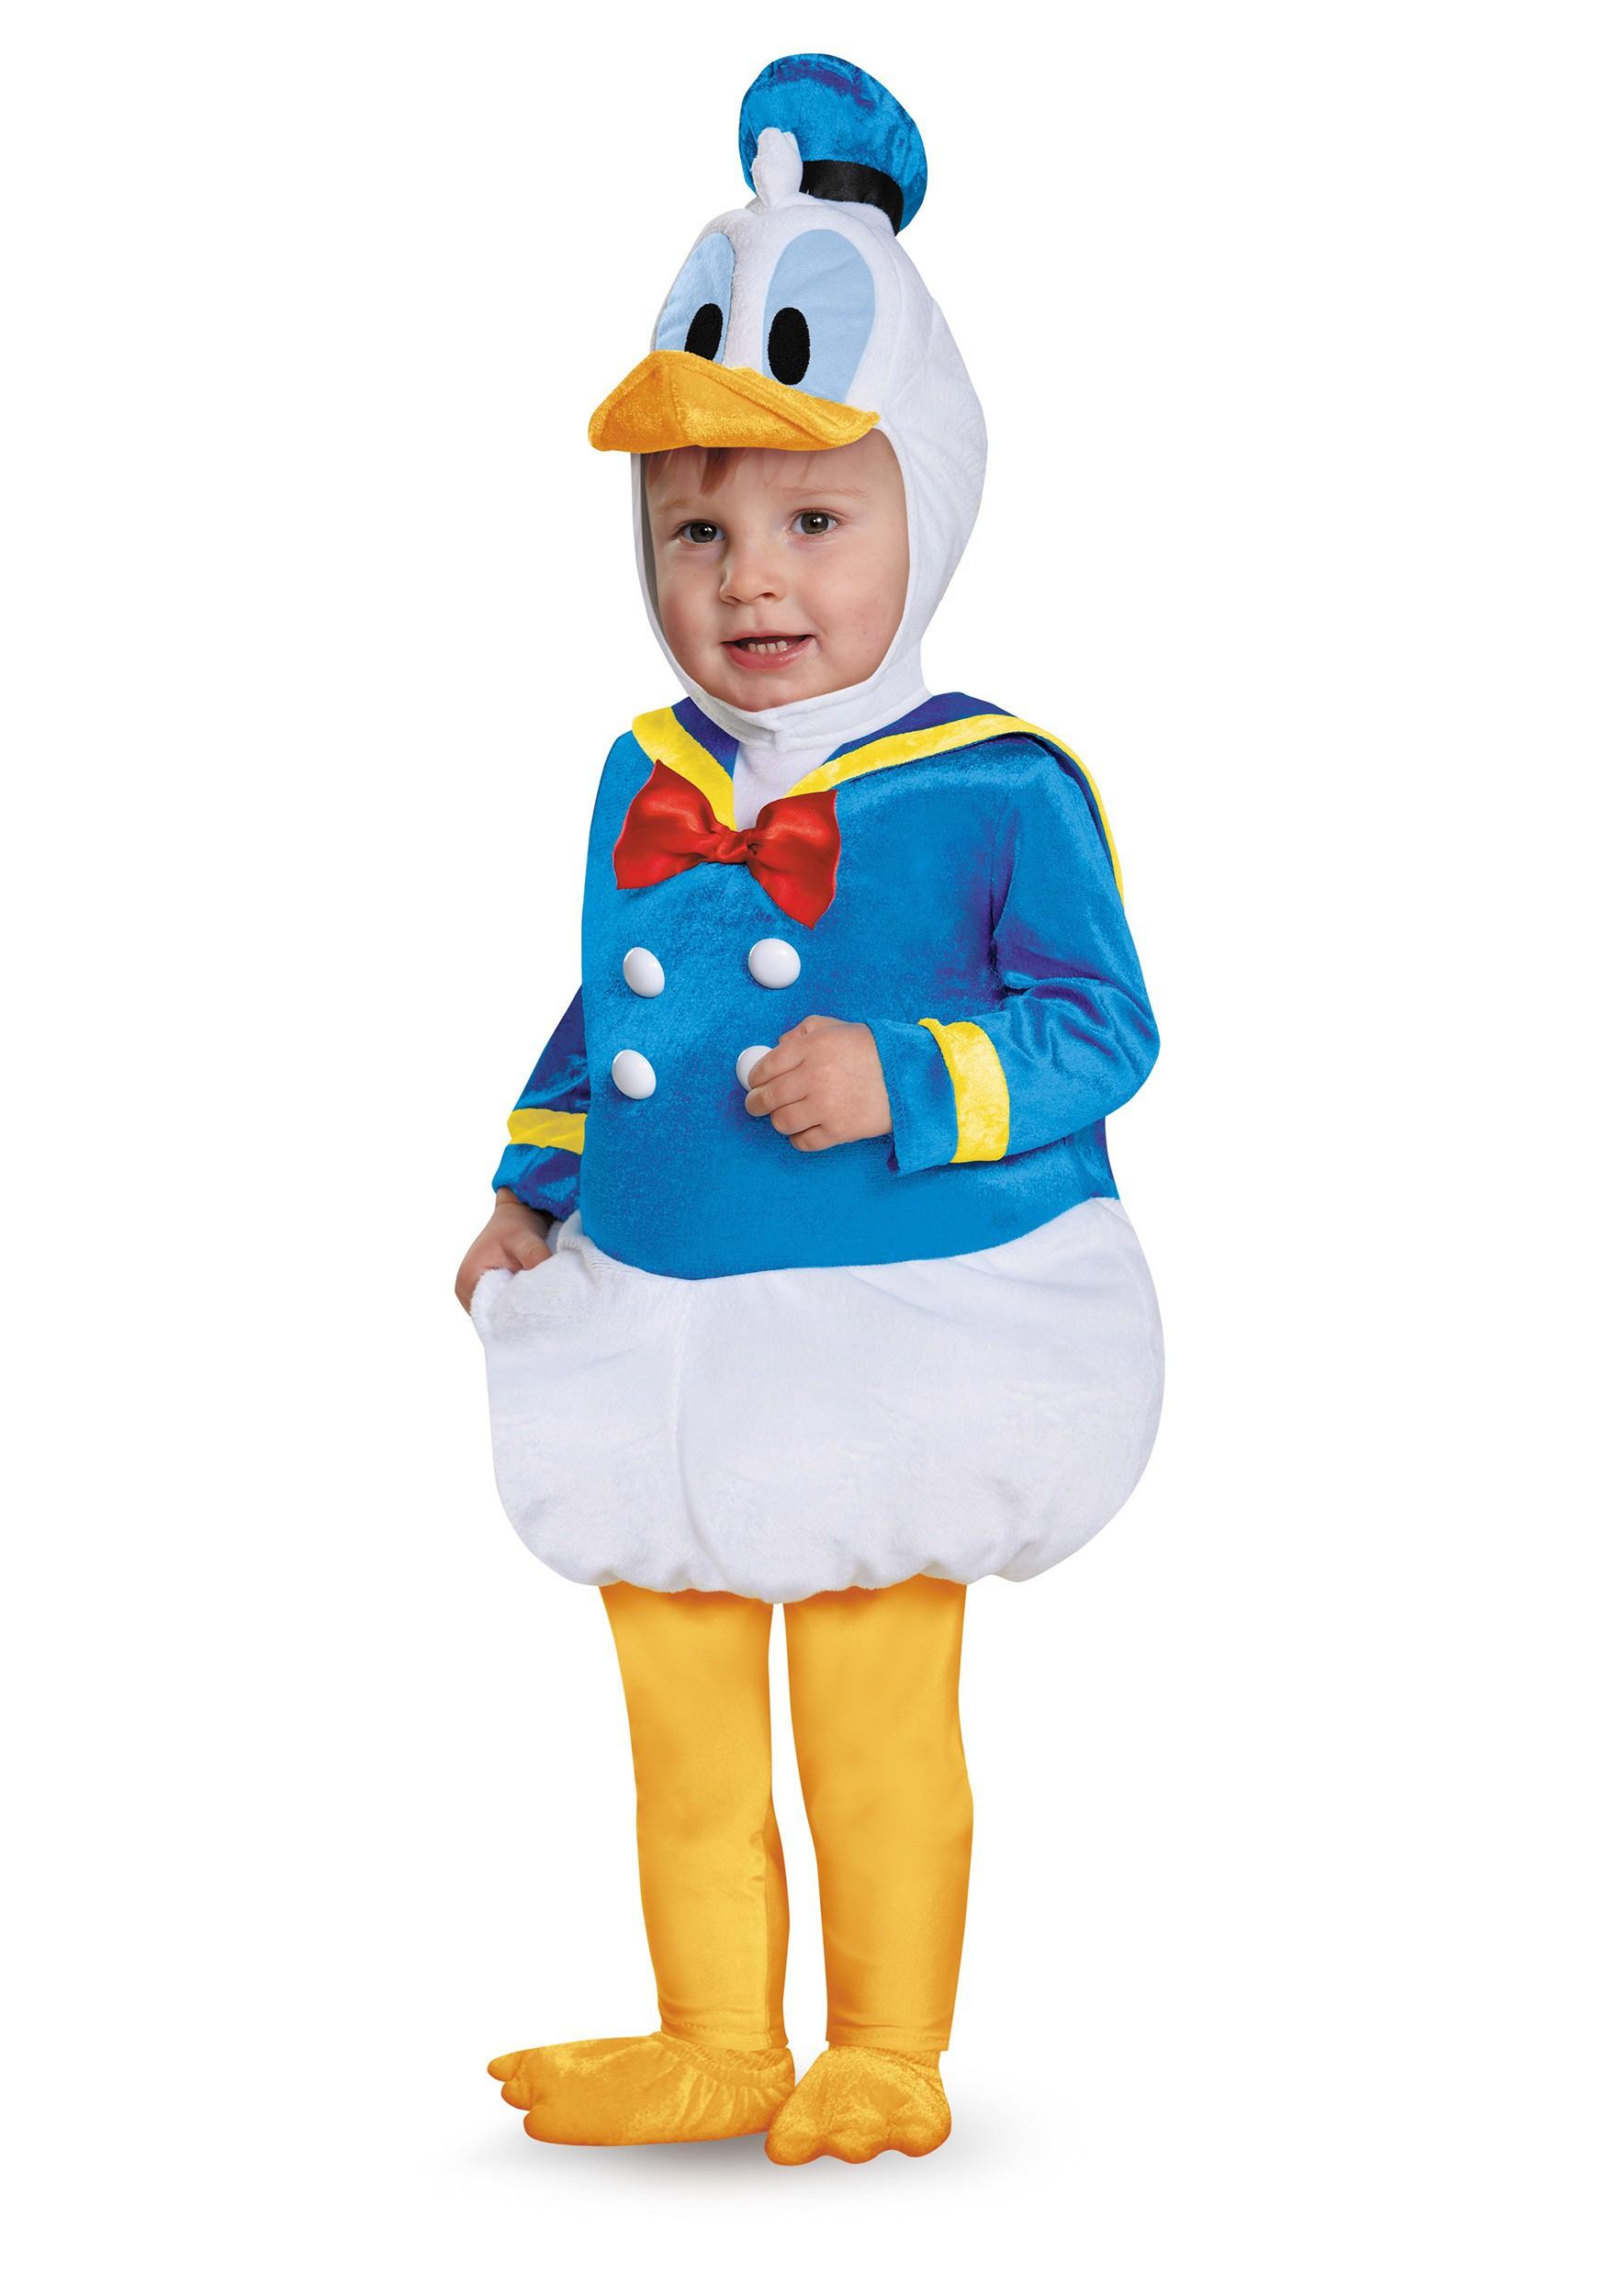 Donald Duck Prestige Infant Costume  Donald Duck Pre...